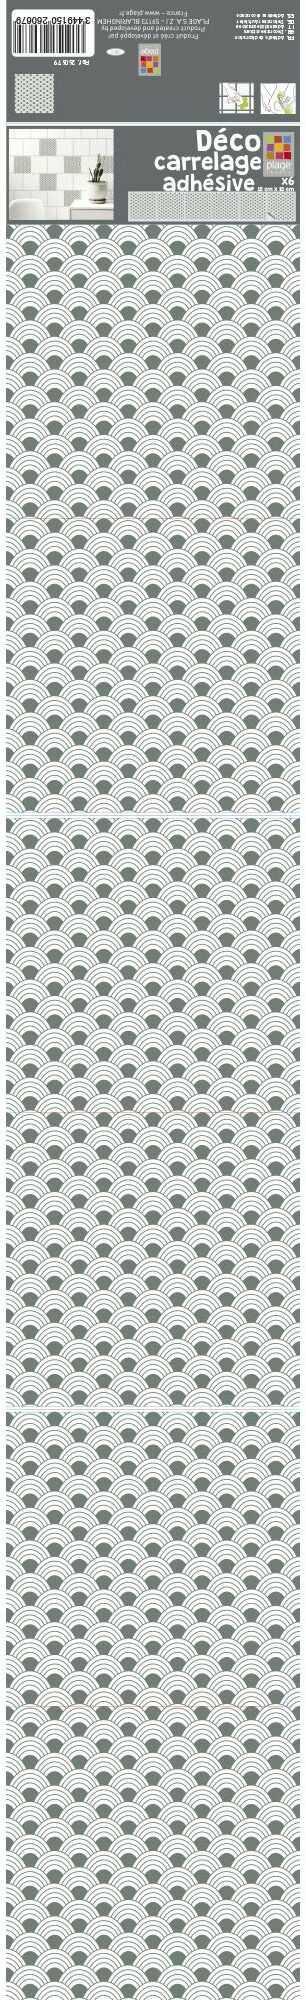 PLAGE 6 płytek stroik - Ozieri, szary, 15 x 15 cm